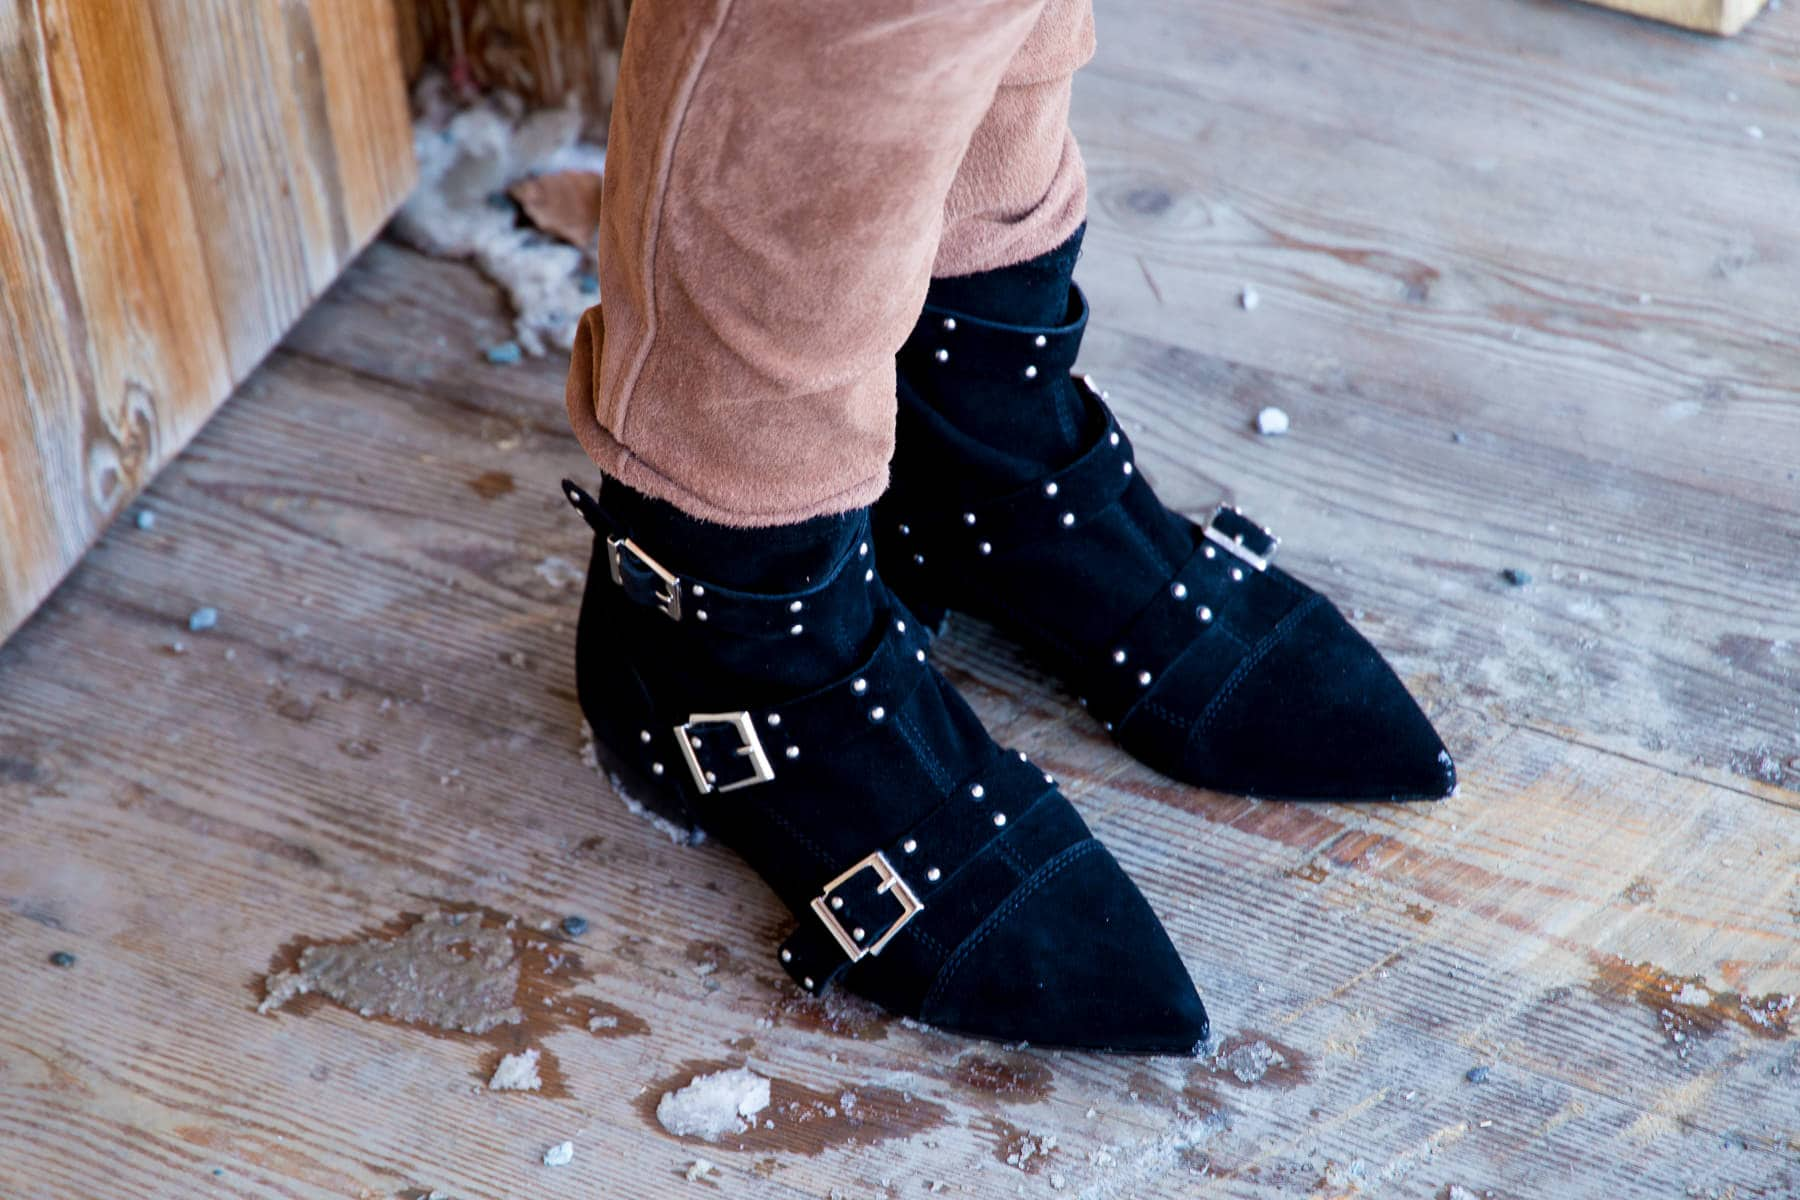 Outfit - Maje Cardigan, Lederhose & Isabel Marant Look-a-Like Boots